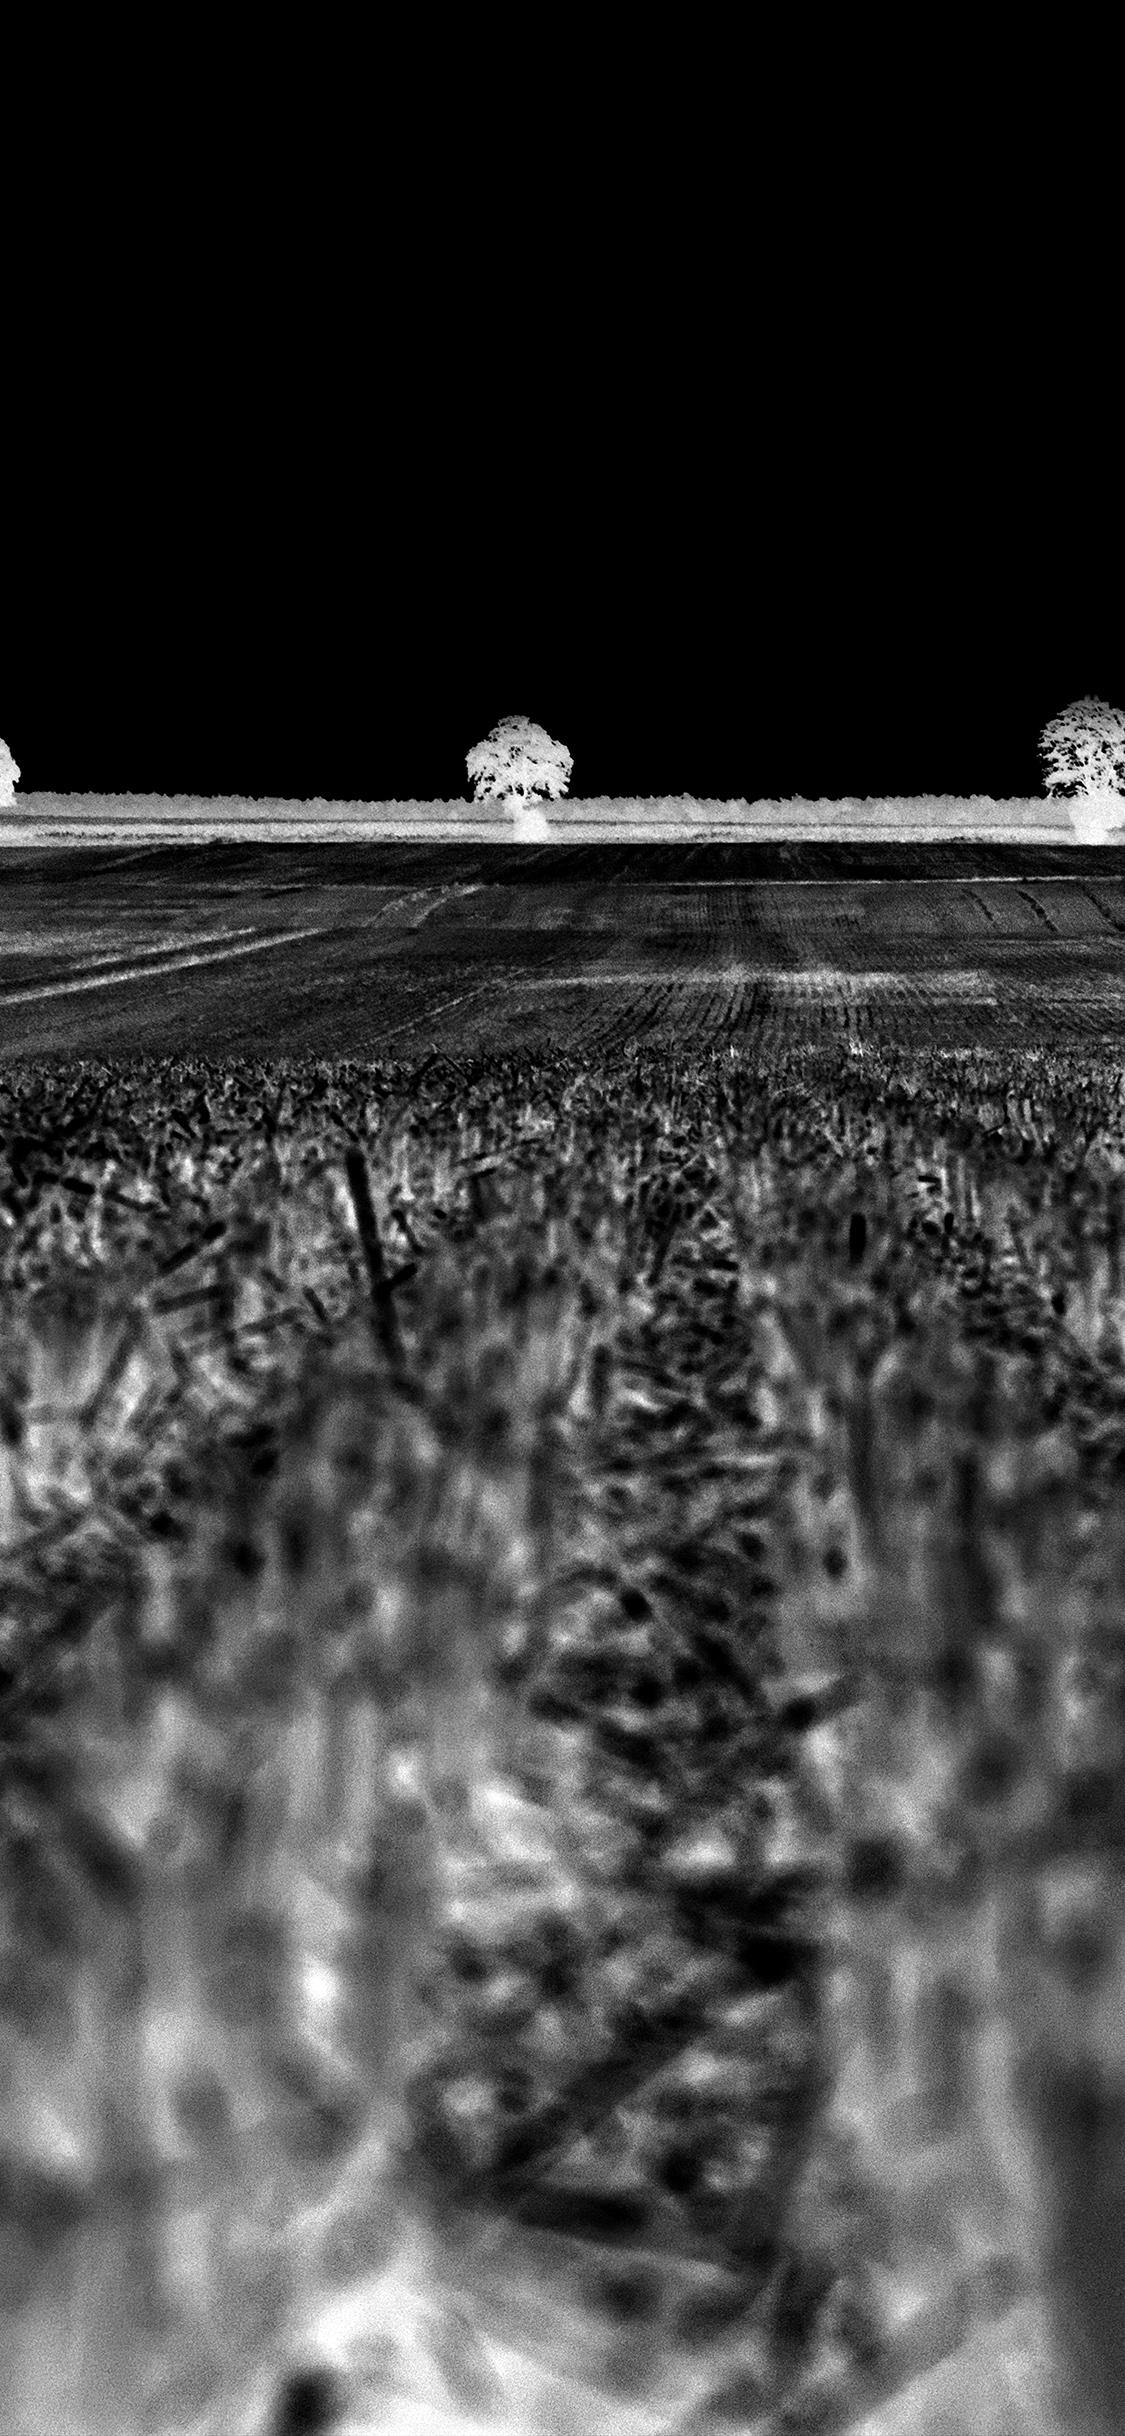 Dark Fall Android Wallpaper Na24 Farm Fall Field Nature Flare Dark Bw Wallpaper